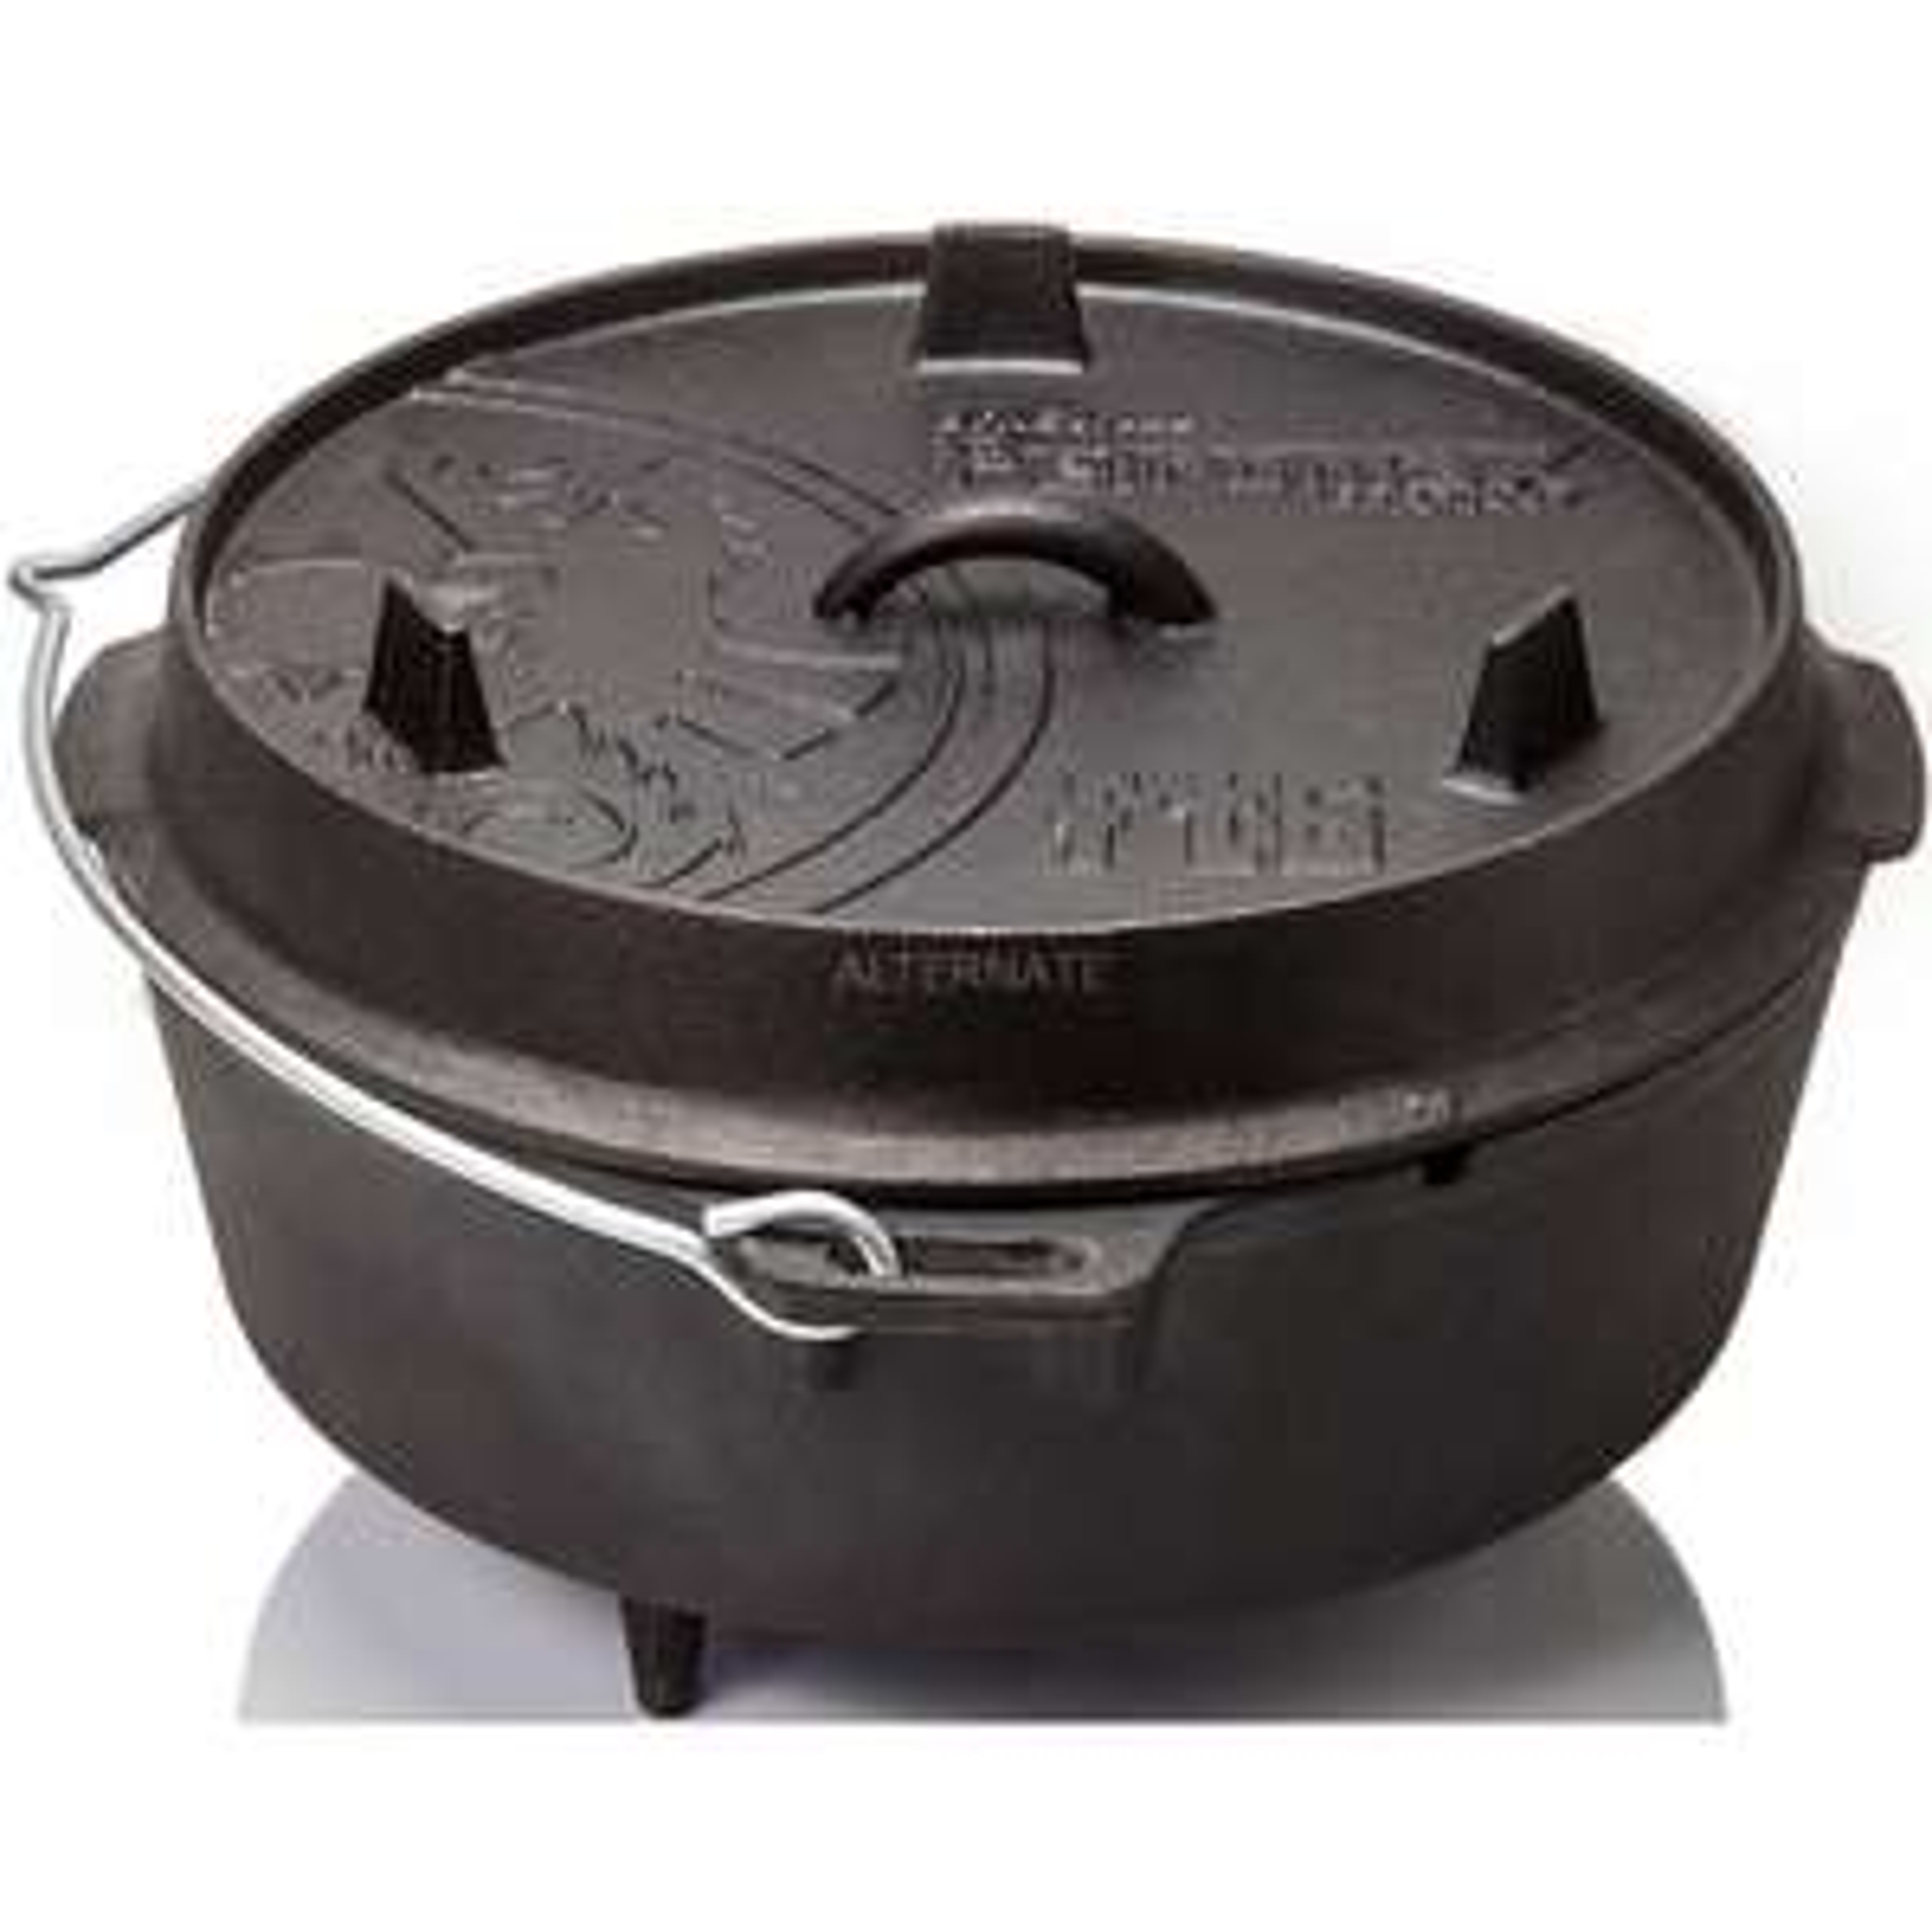 Petromax Feuertopf ft6 (Dutch Oven) schwarz, mit Füßen inkl. Petromax Deckelheber